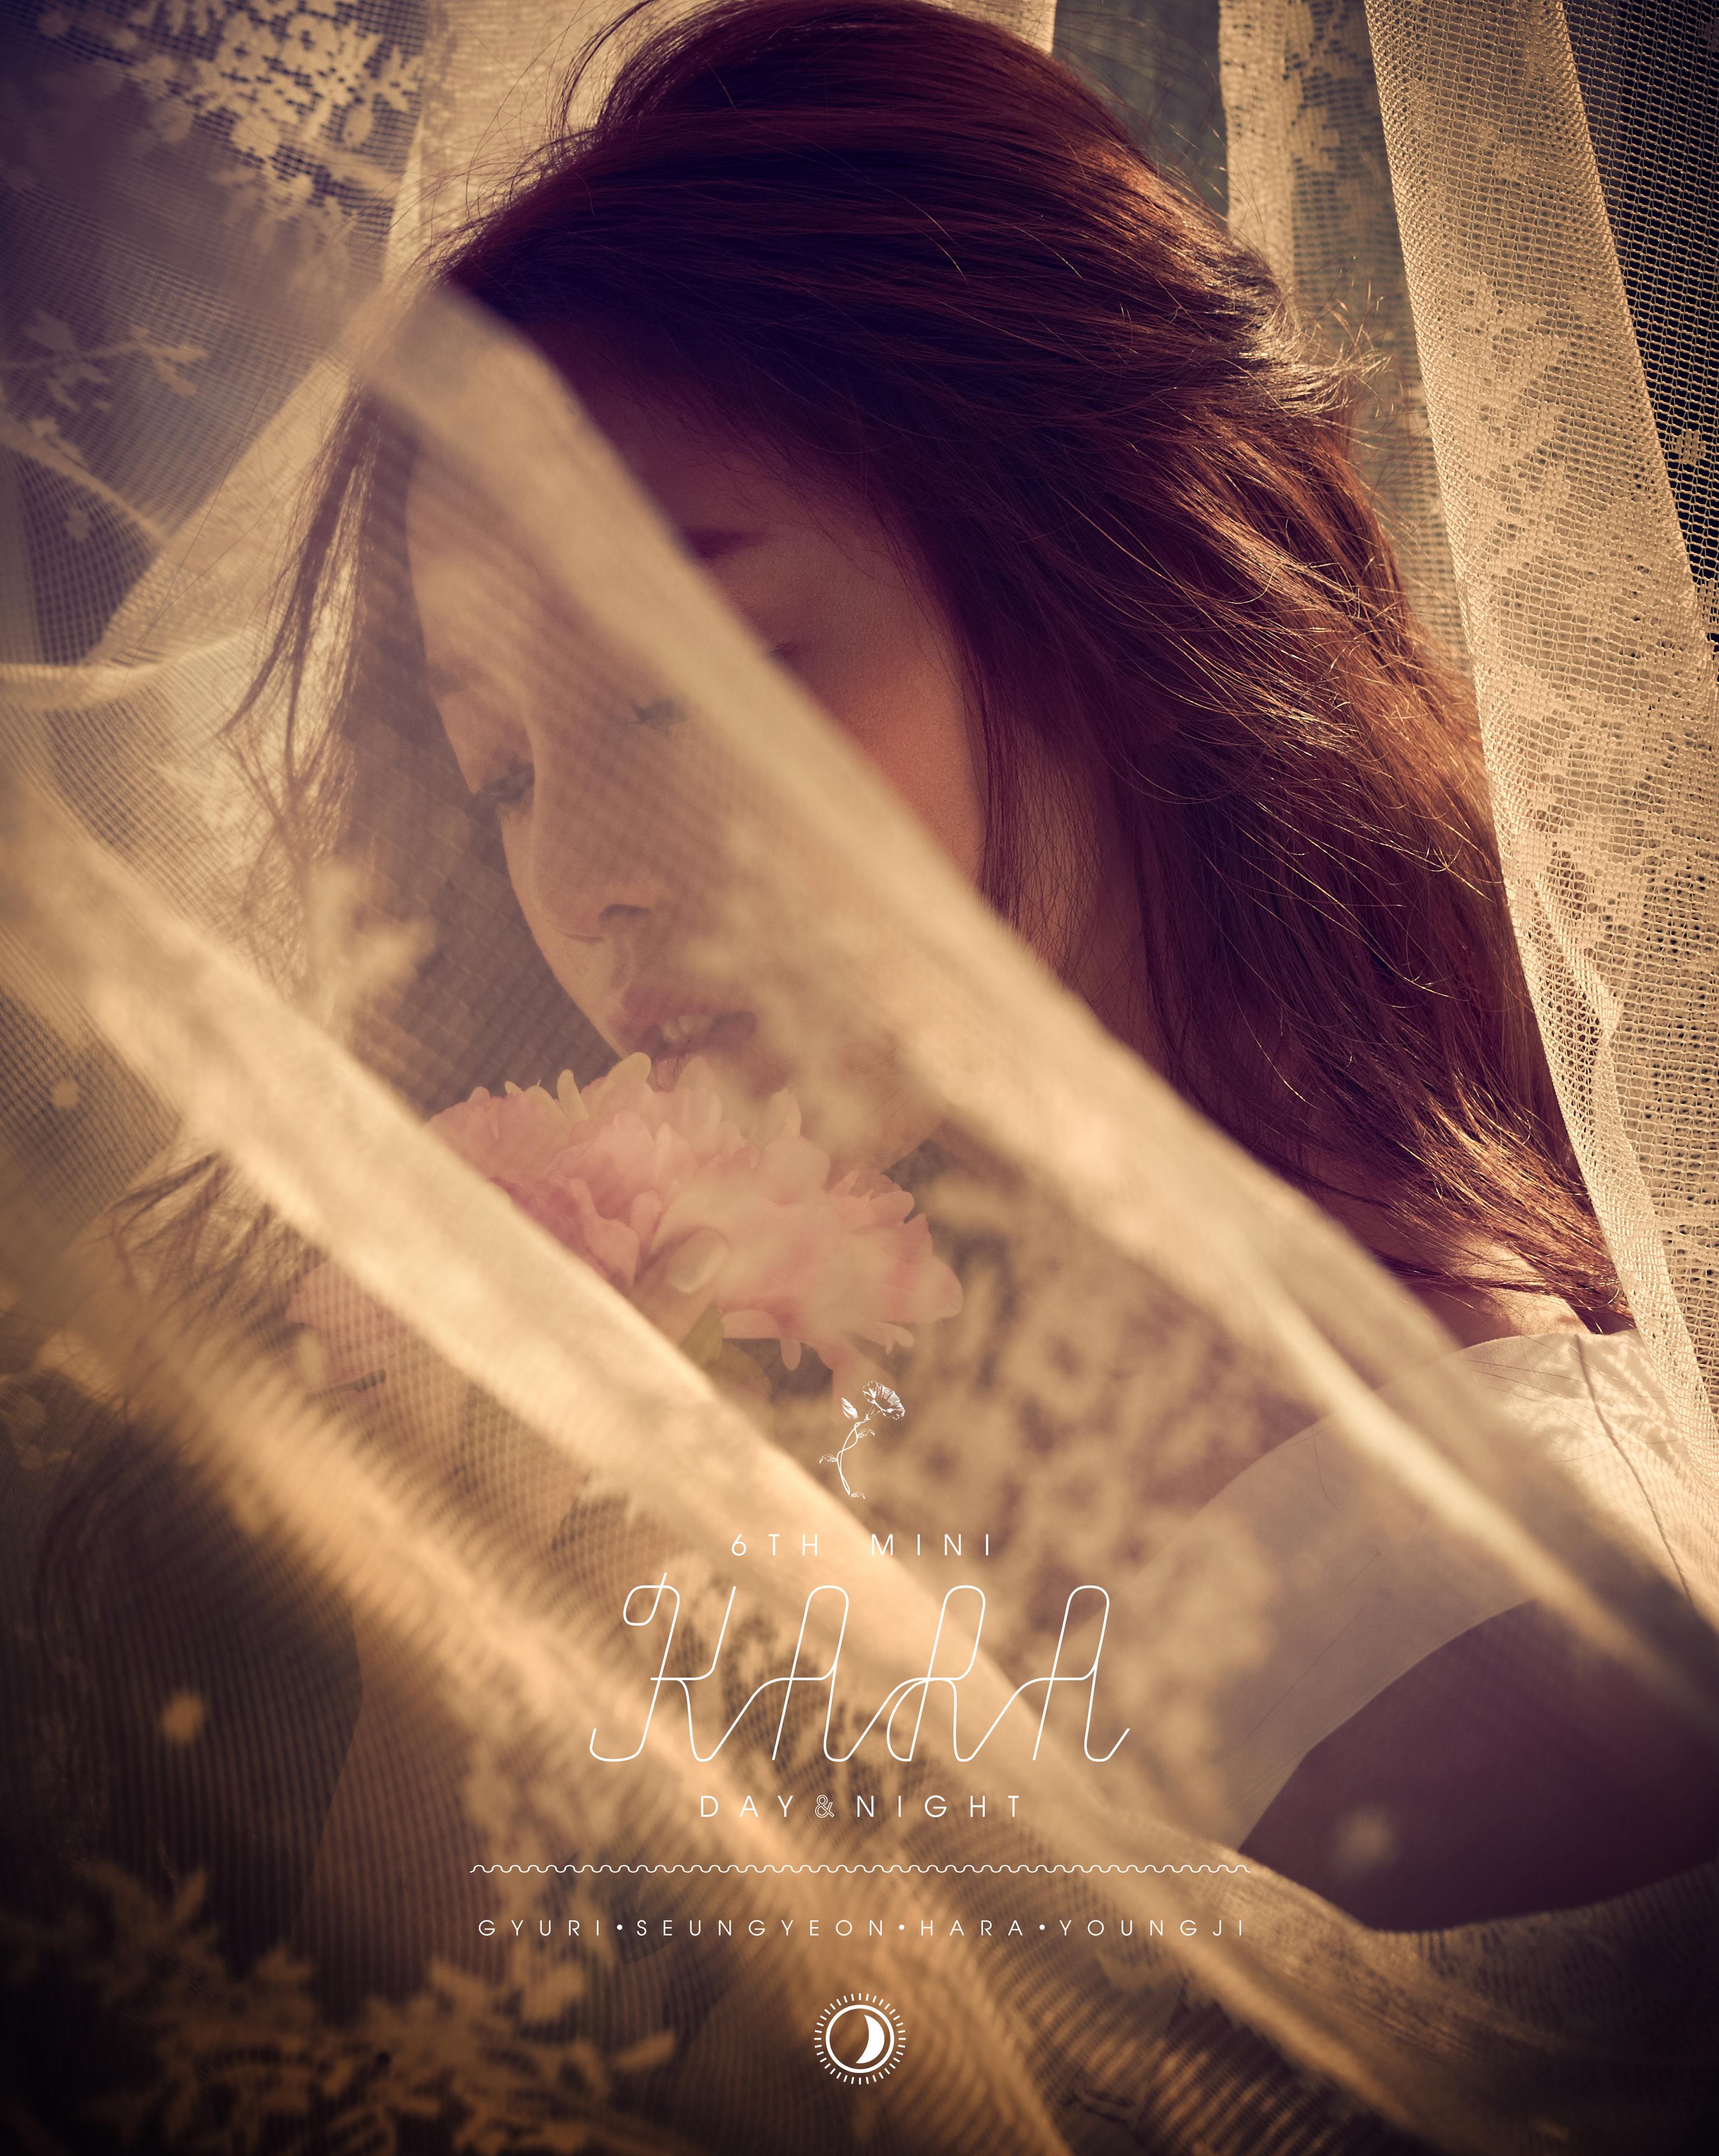 KARA Hara 'Day & Night' Teaser 3 HQ